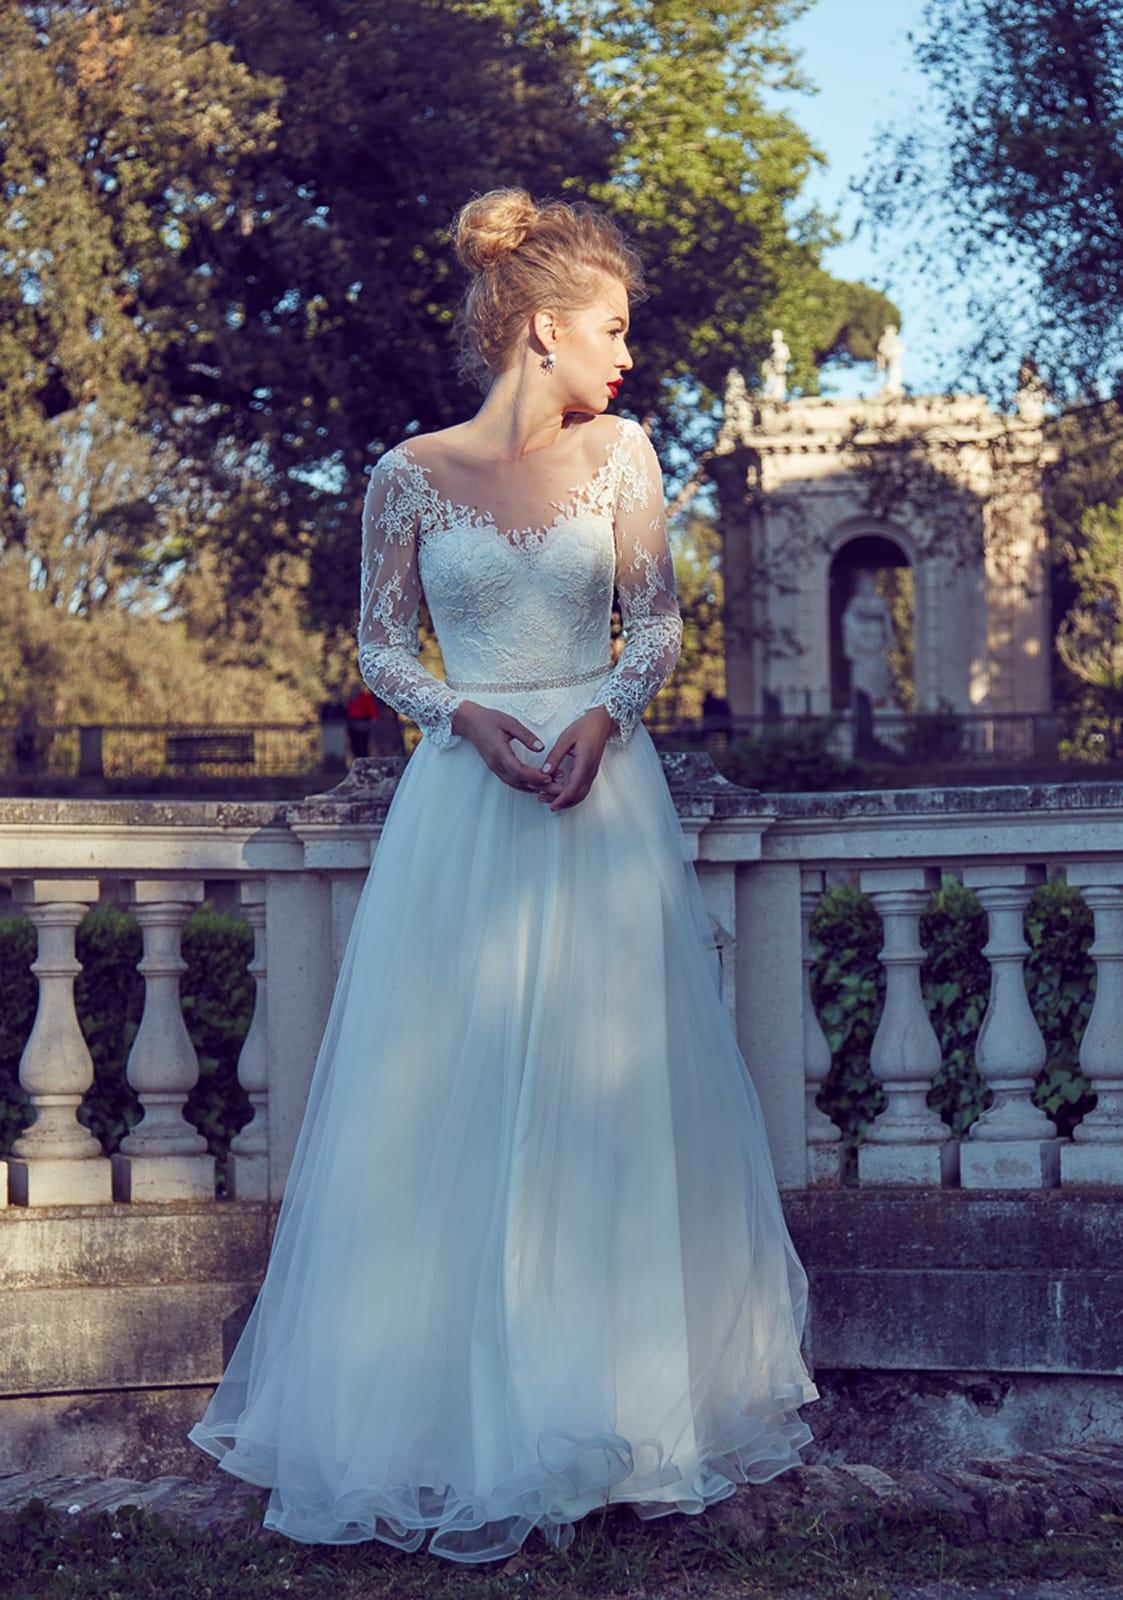 Nieve Model - Colectia Roma - Adora Sposa (3)